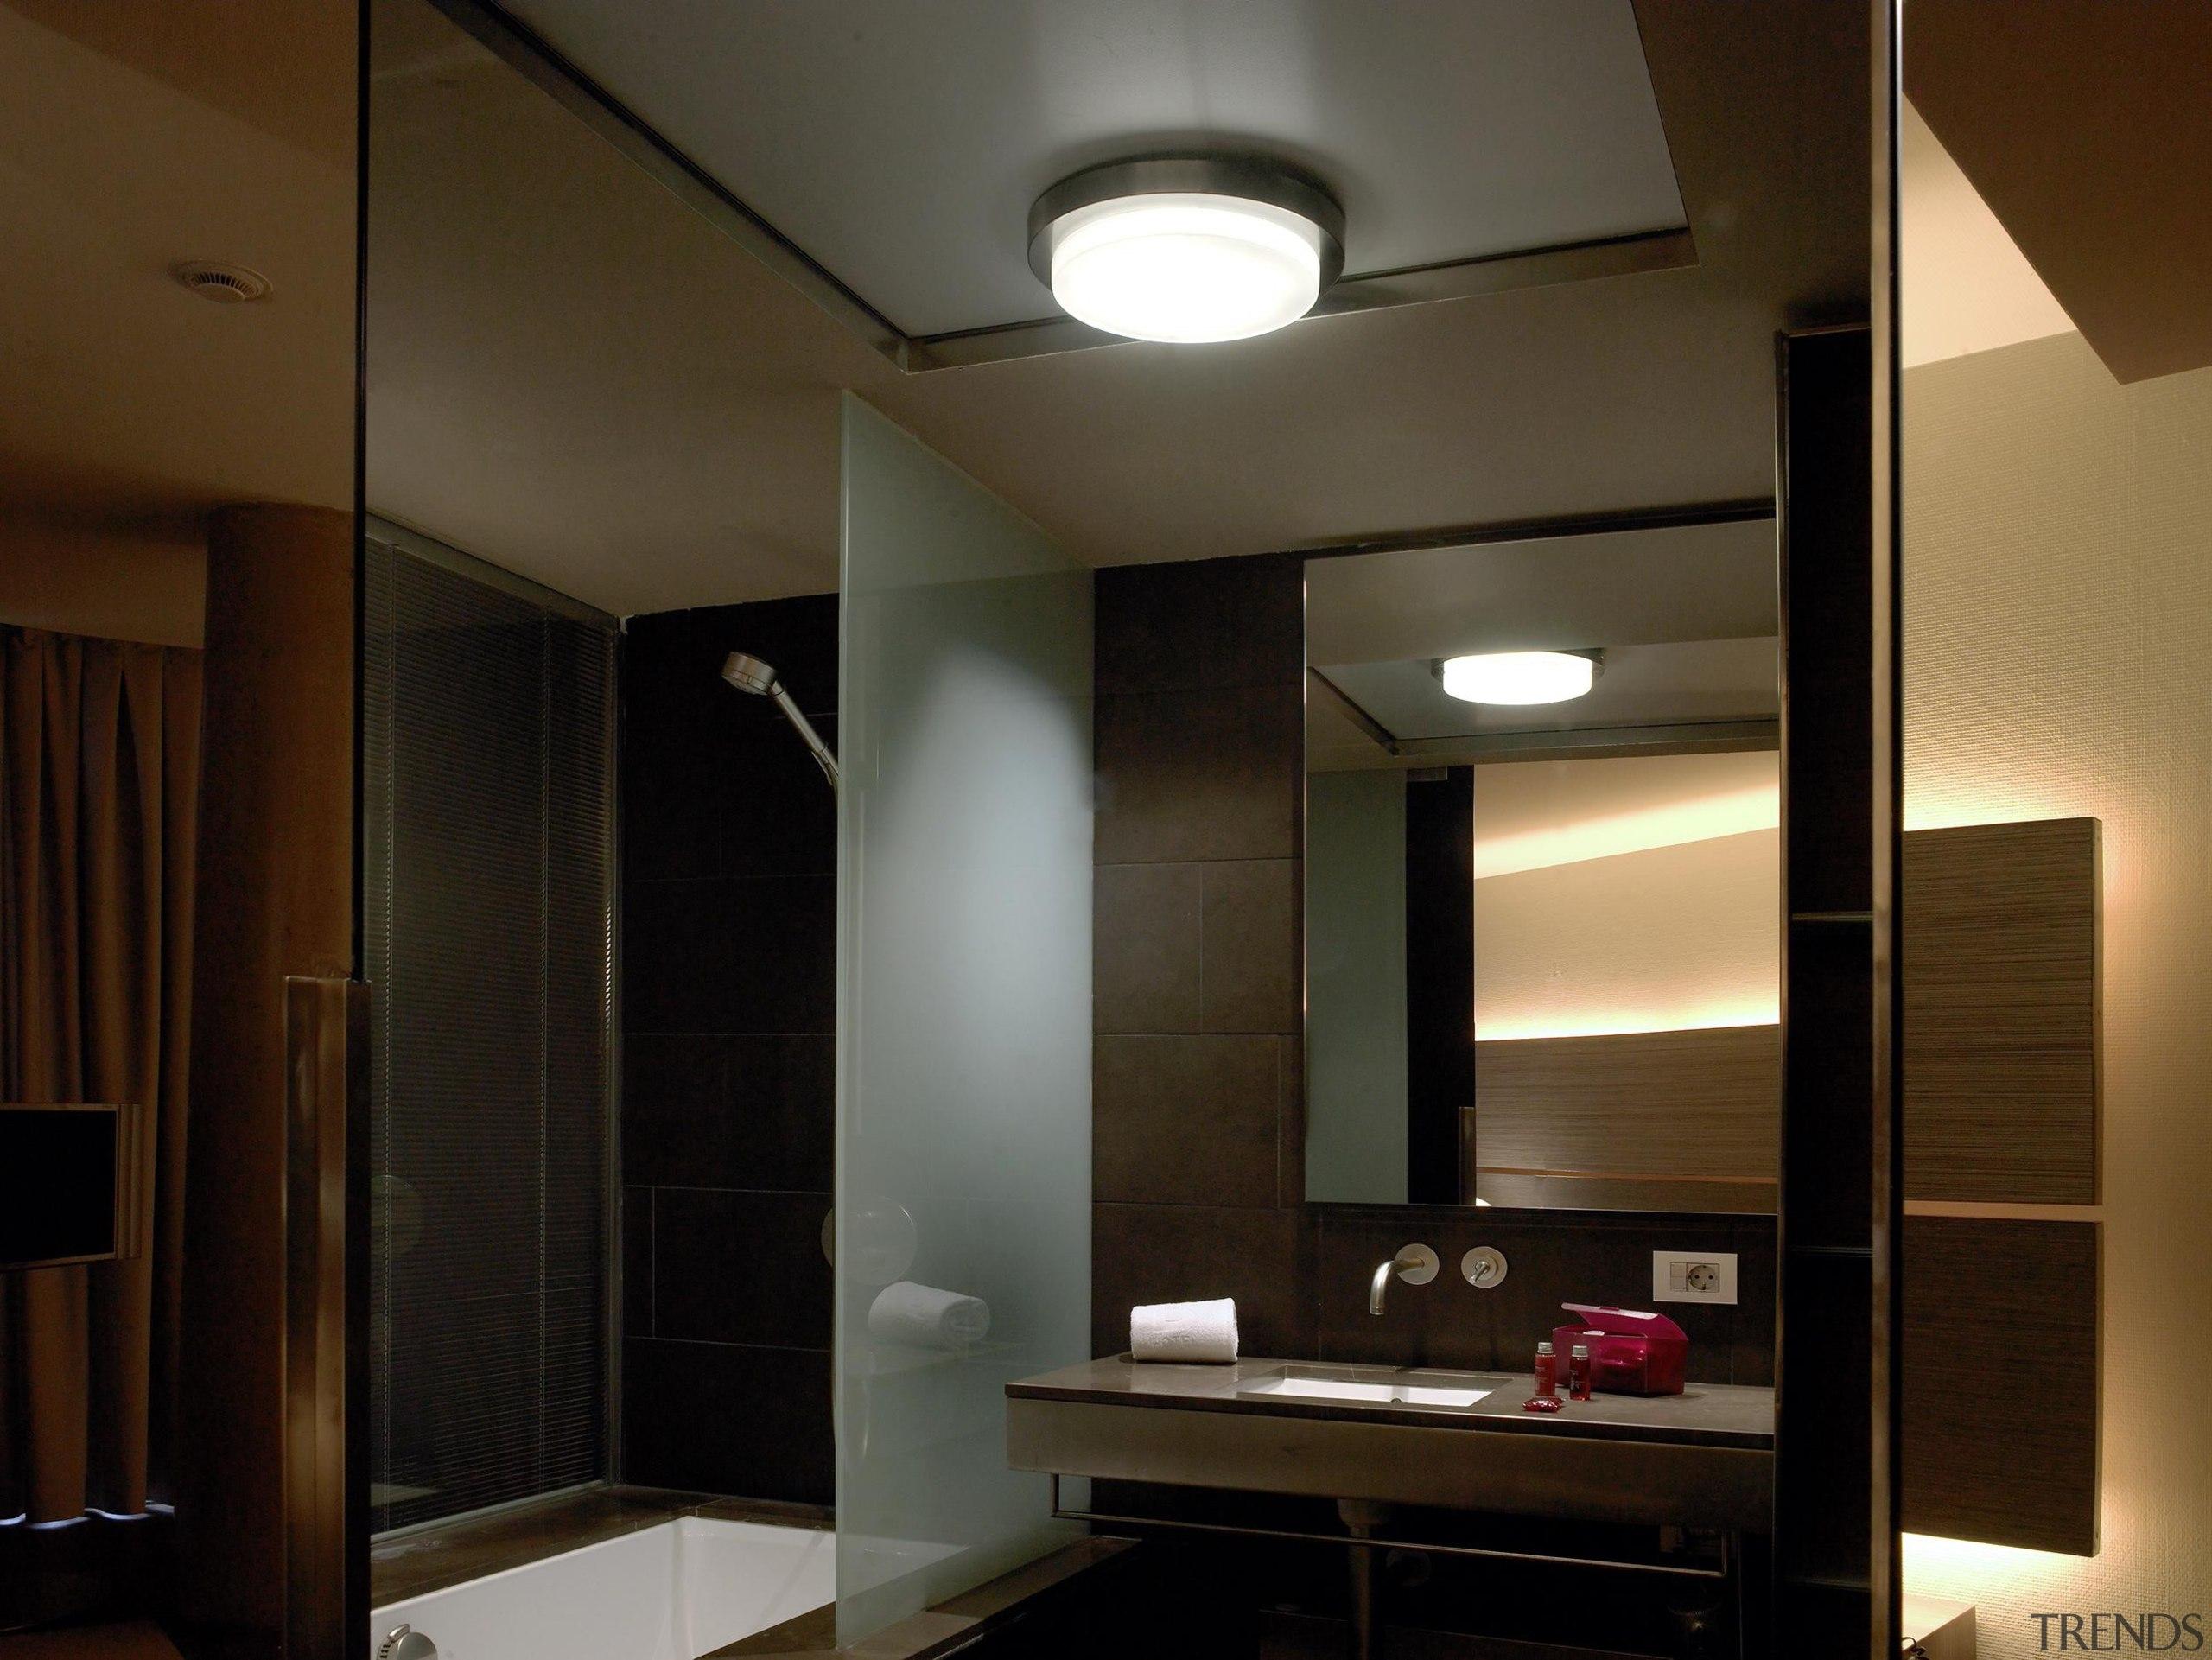 Ceiling Lights - Ceiling Lights - ceiling | ceiling, daylighting, interior design, light, light fixture, lighting, room, brown, black